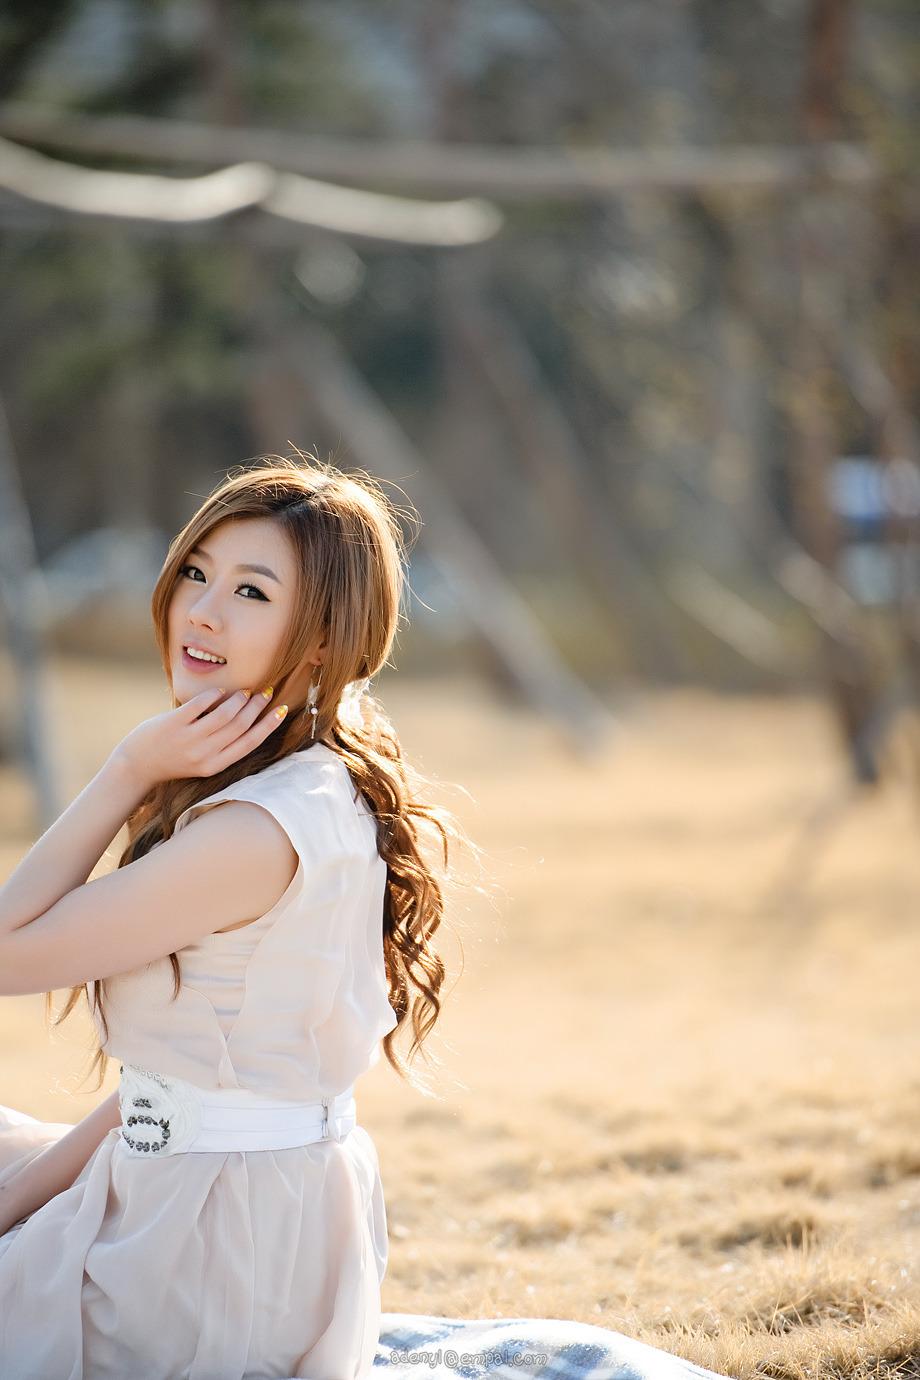 Snsd taeyeon sexy dance - 3 7